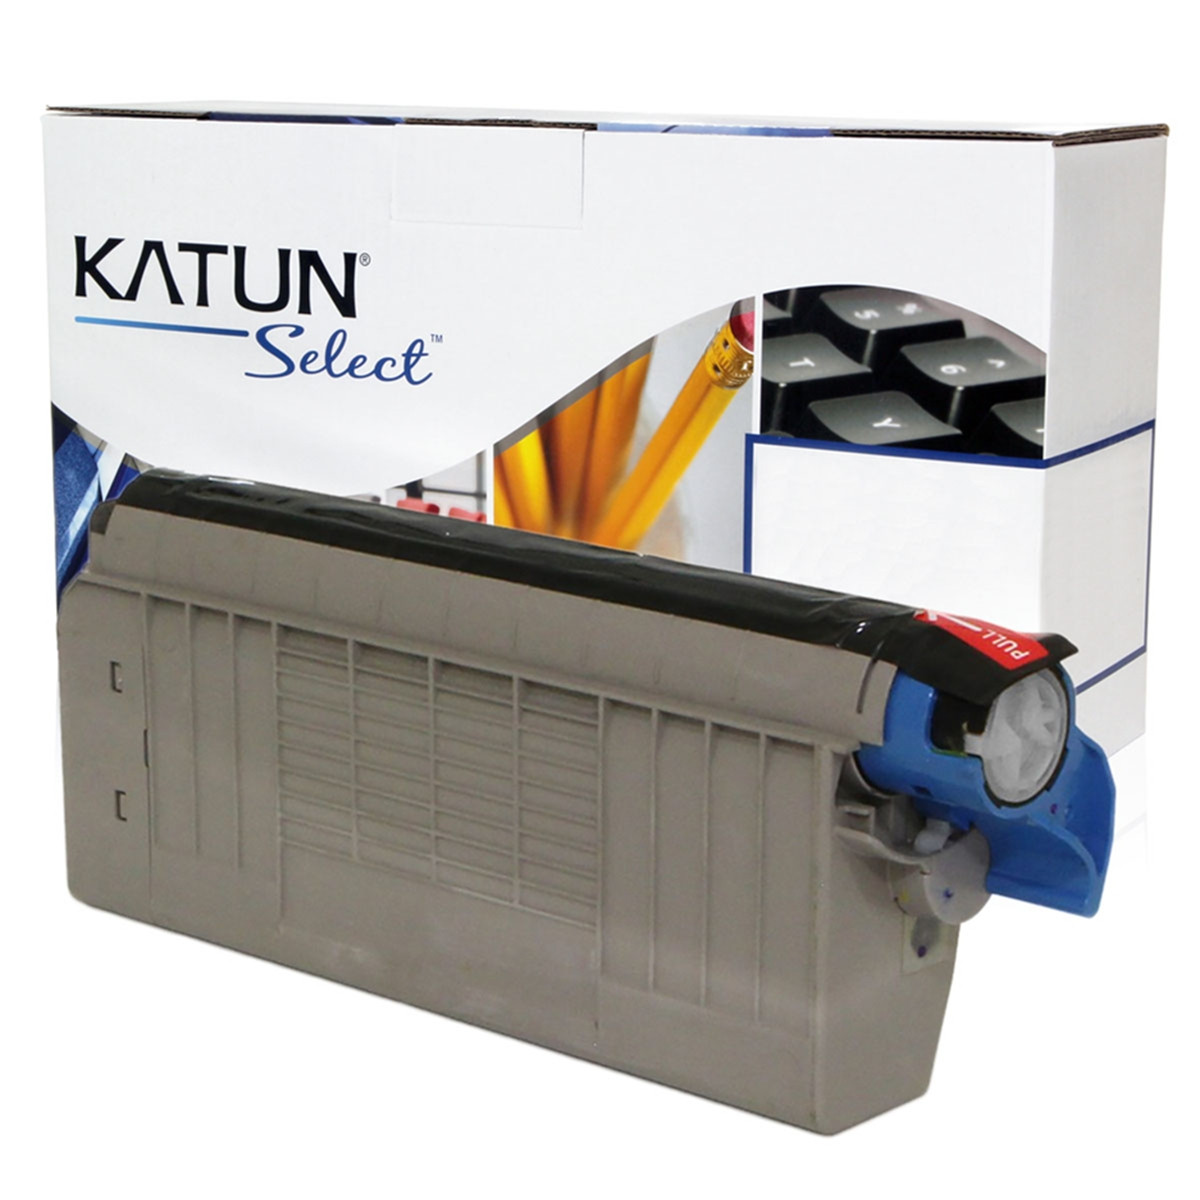 Toner Okidata Magenta C711 C710 C710N C711N C710DN C711DN | 43866102 44318602 | Katun Select 11.5k